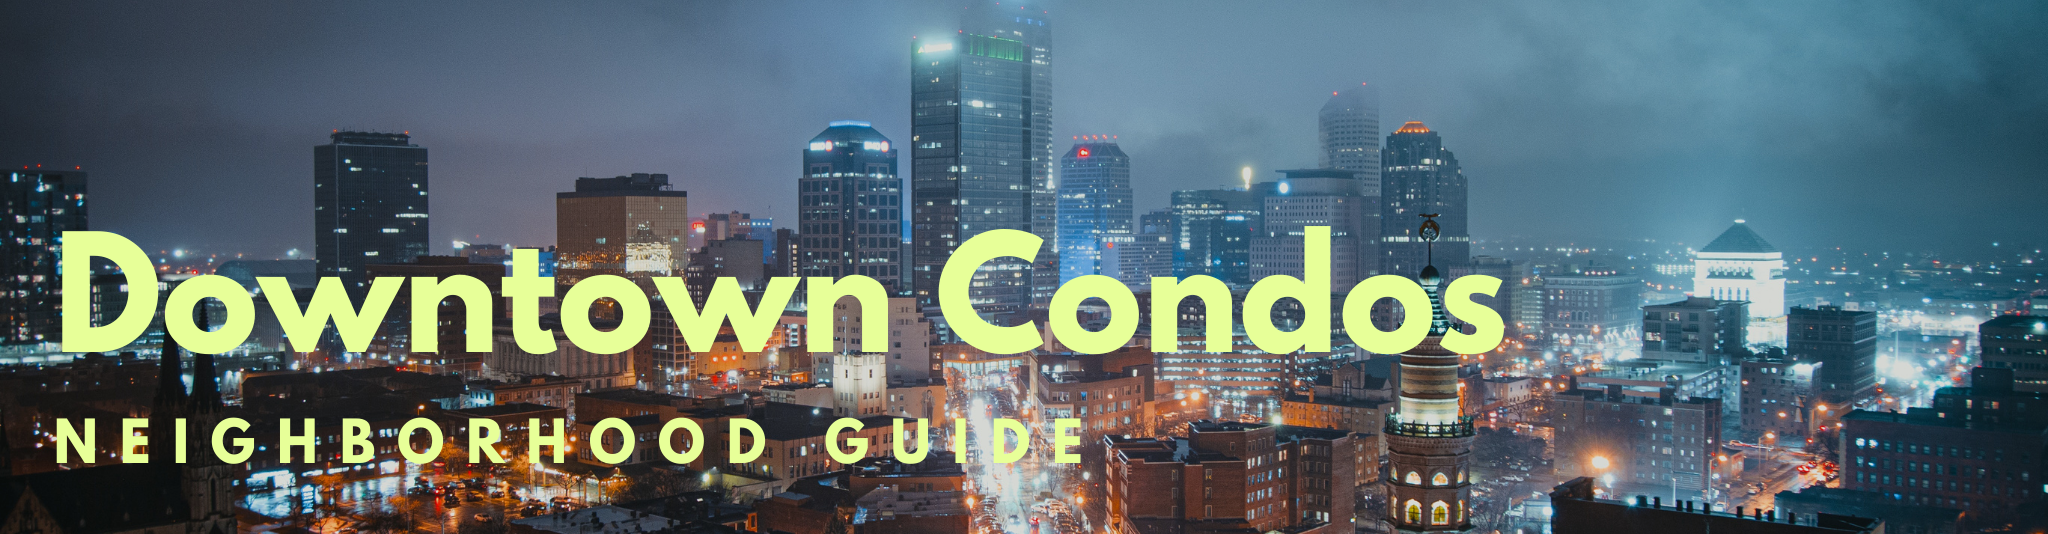 Downtown Indianapolis Condos Neighborhood Guide